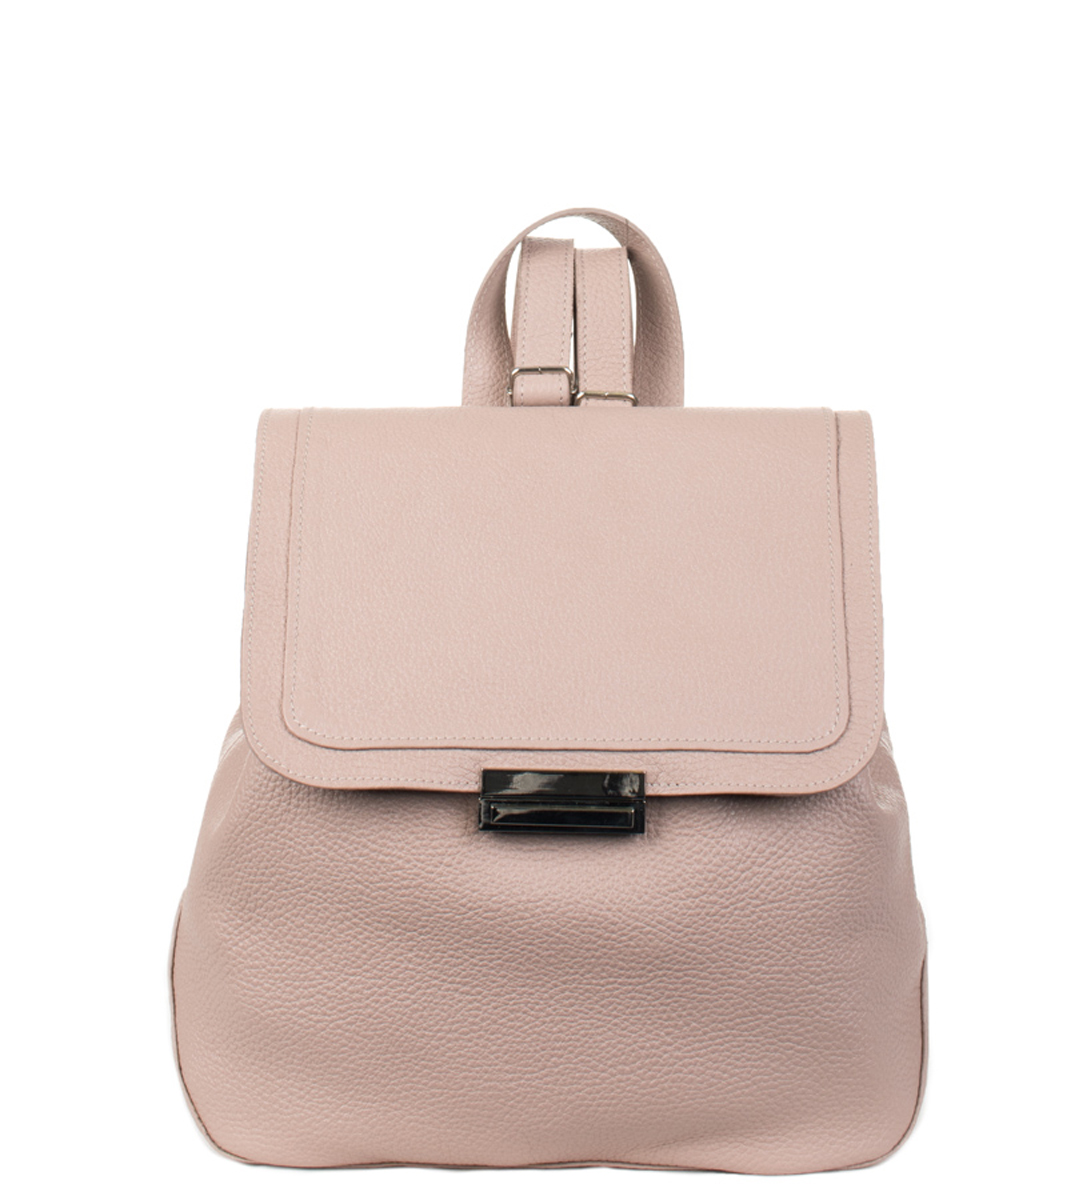 Рюкзак женский Fabio Bruno, цвет: аманда. R-1615 кожаный рюкзак